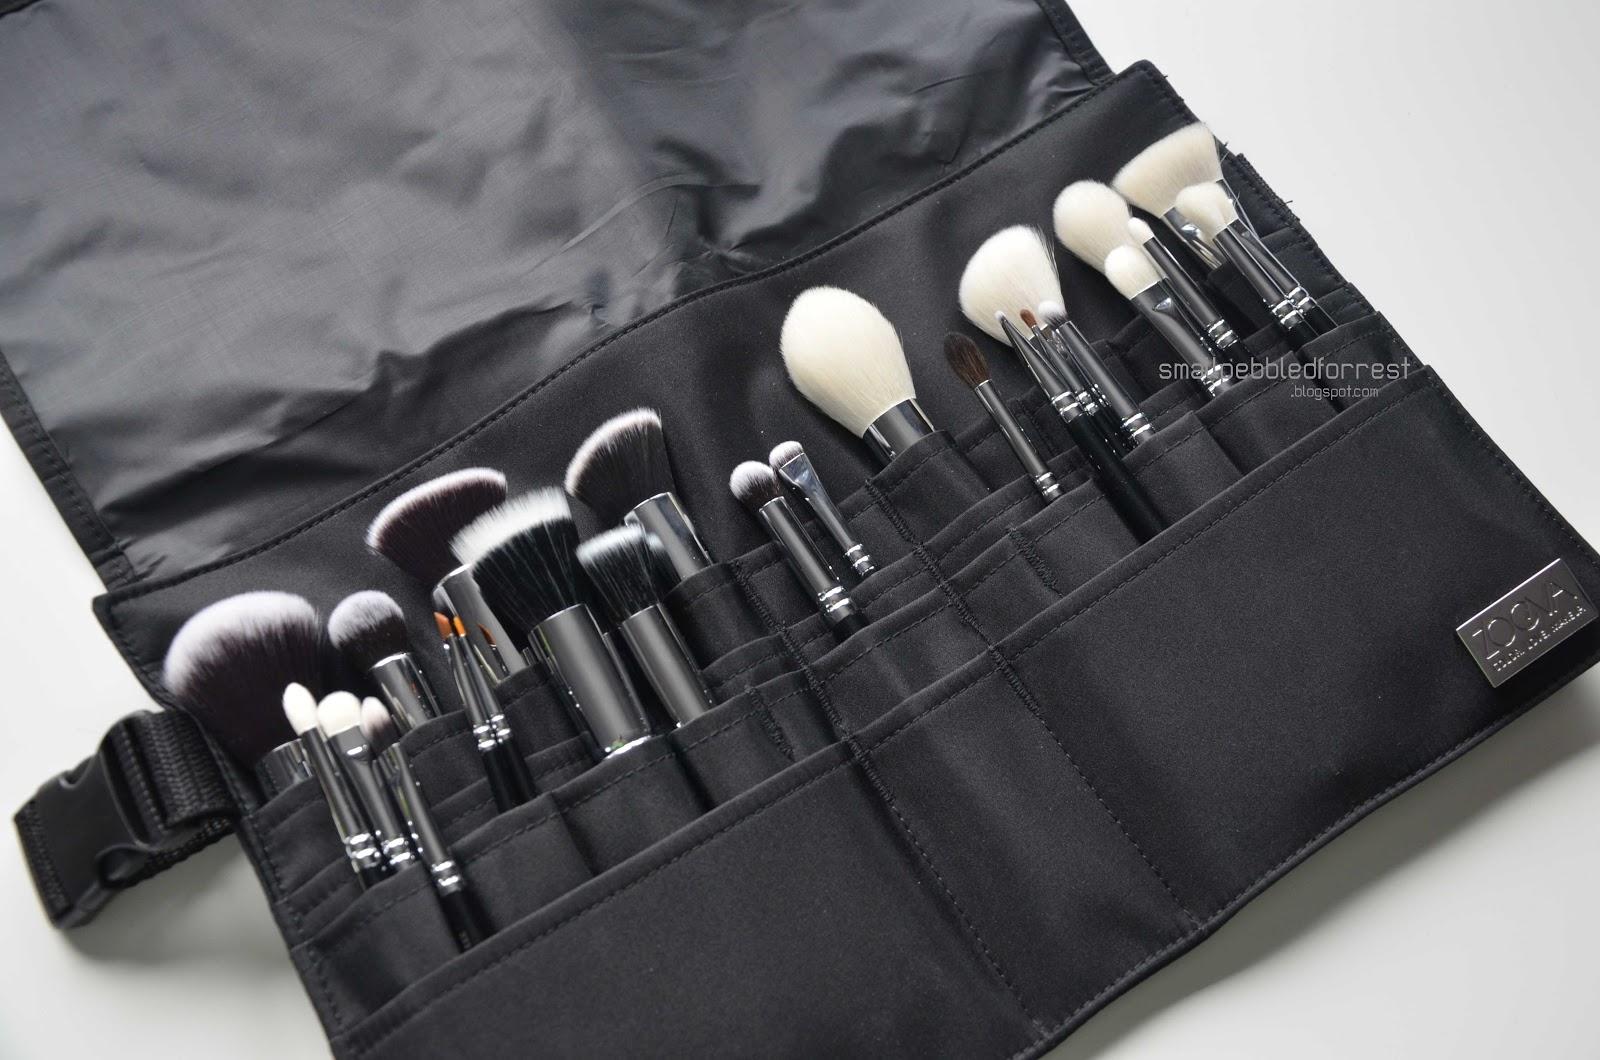 zoeva makeup artist brush belt liquid confidence. Black Bedroom Furniture Sets. Home Design Ideas